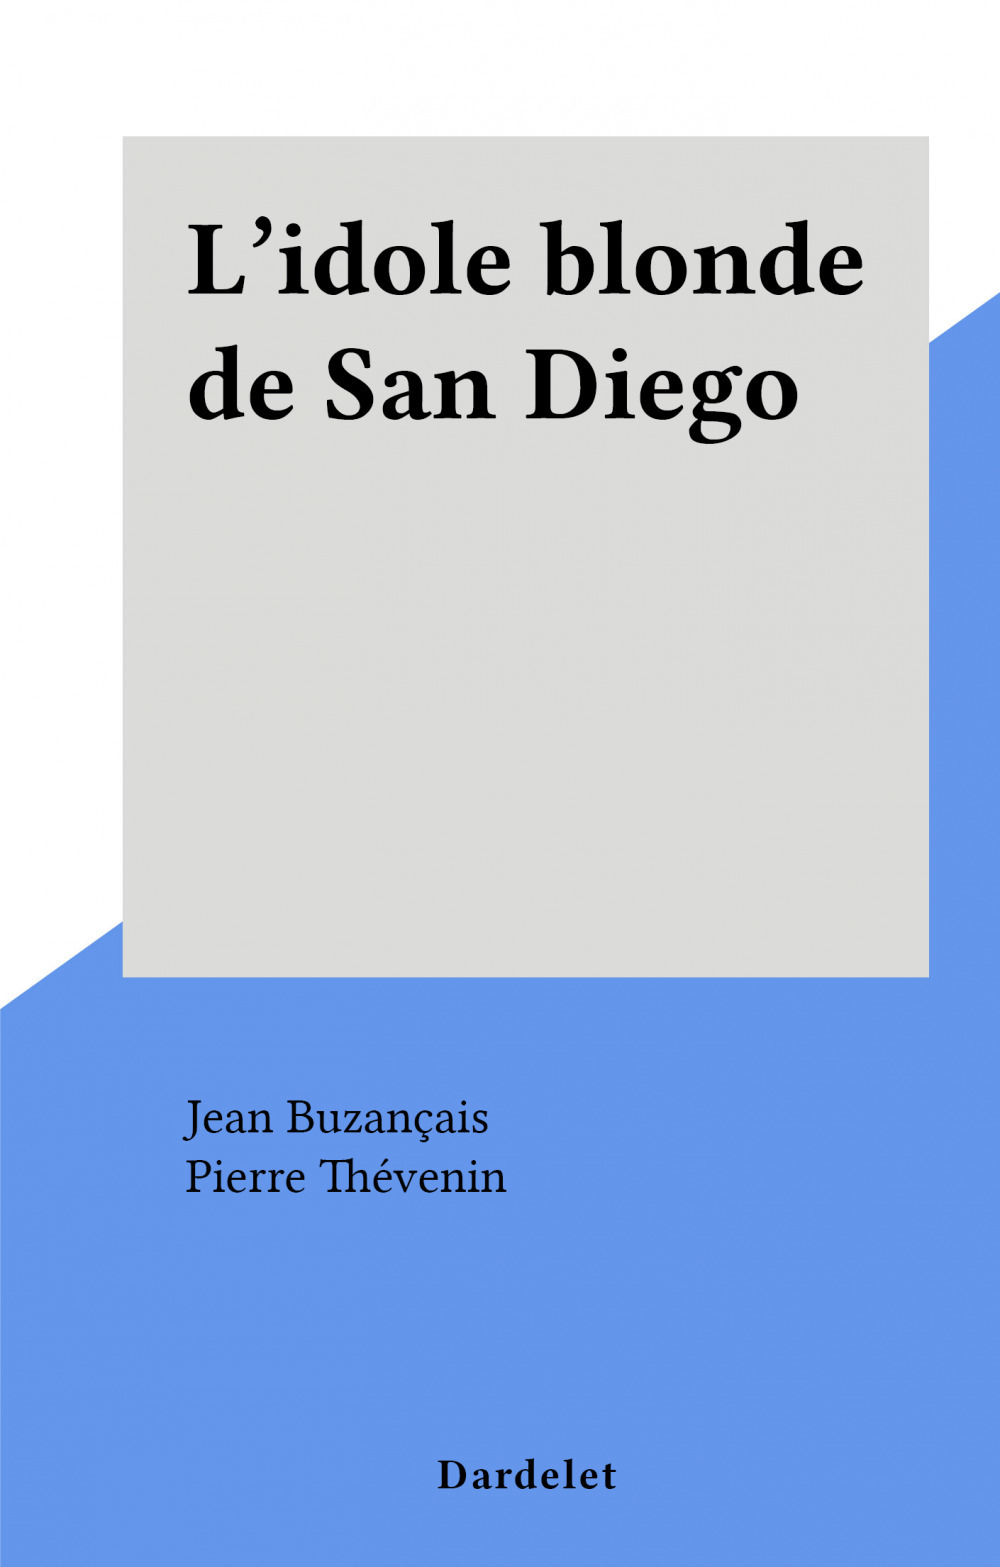 L'idole blonde de San Diego